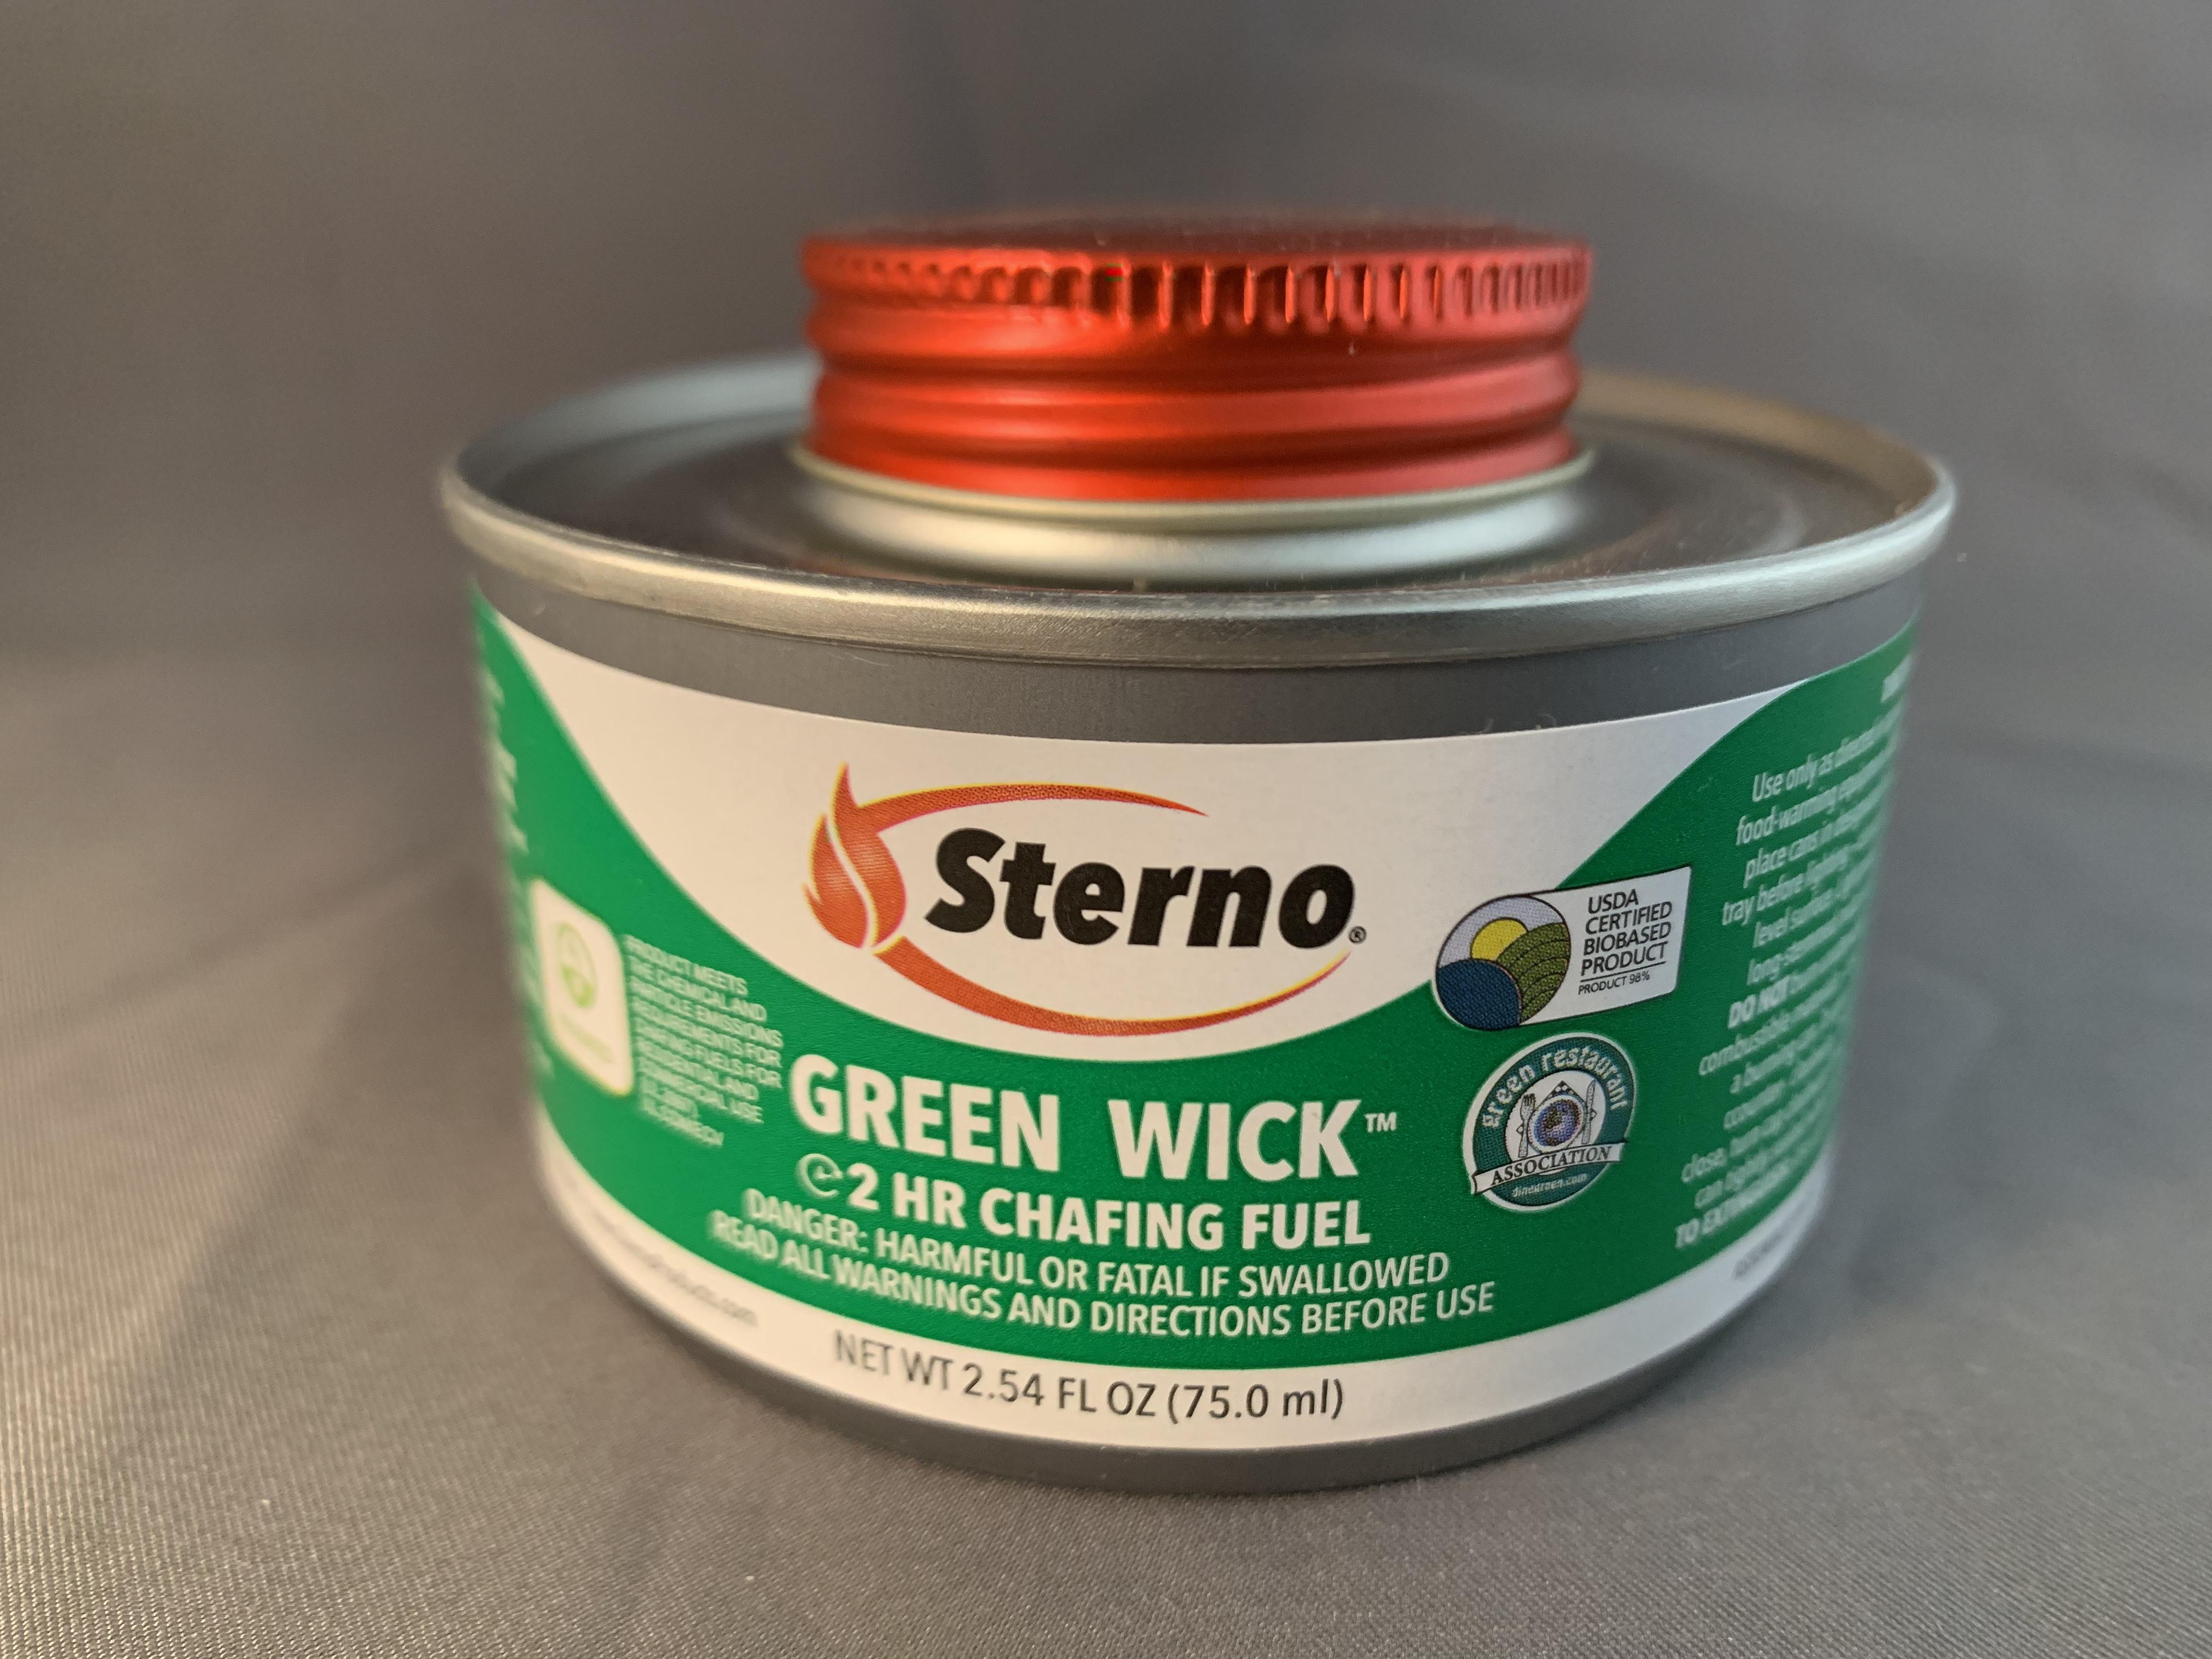 Sterno Green Wick